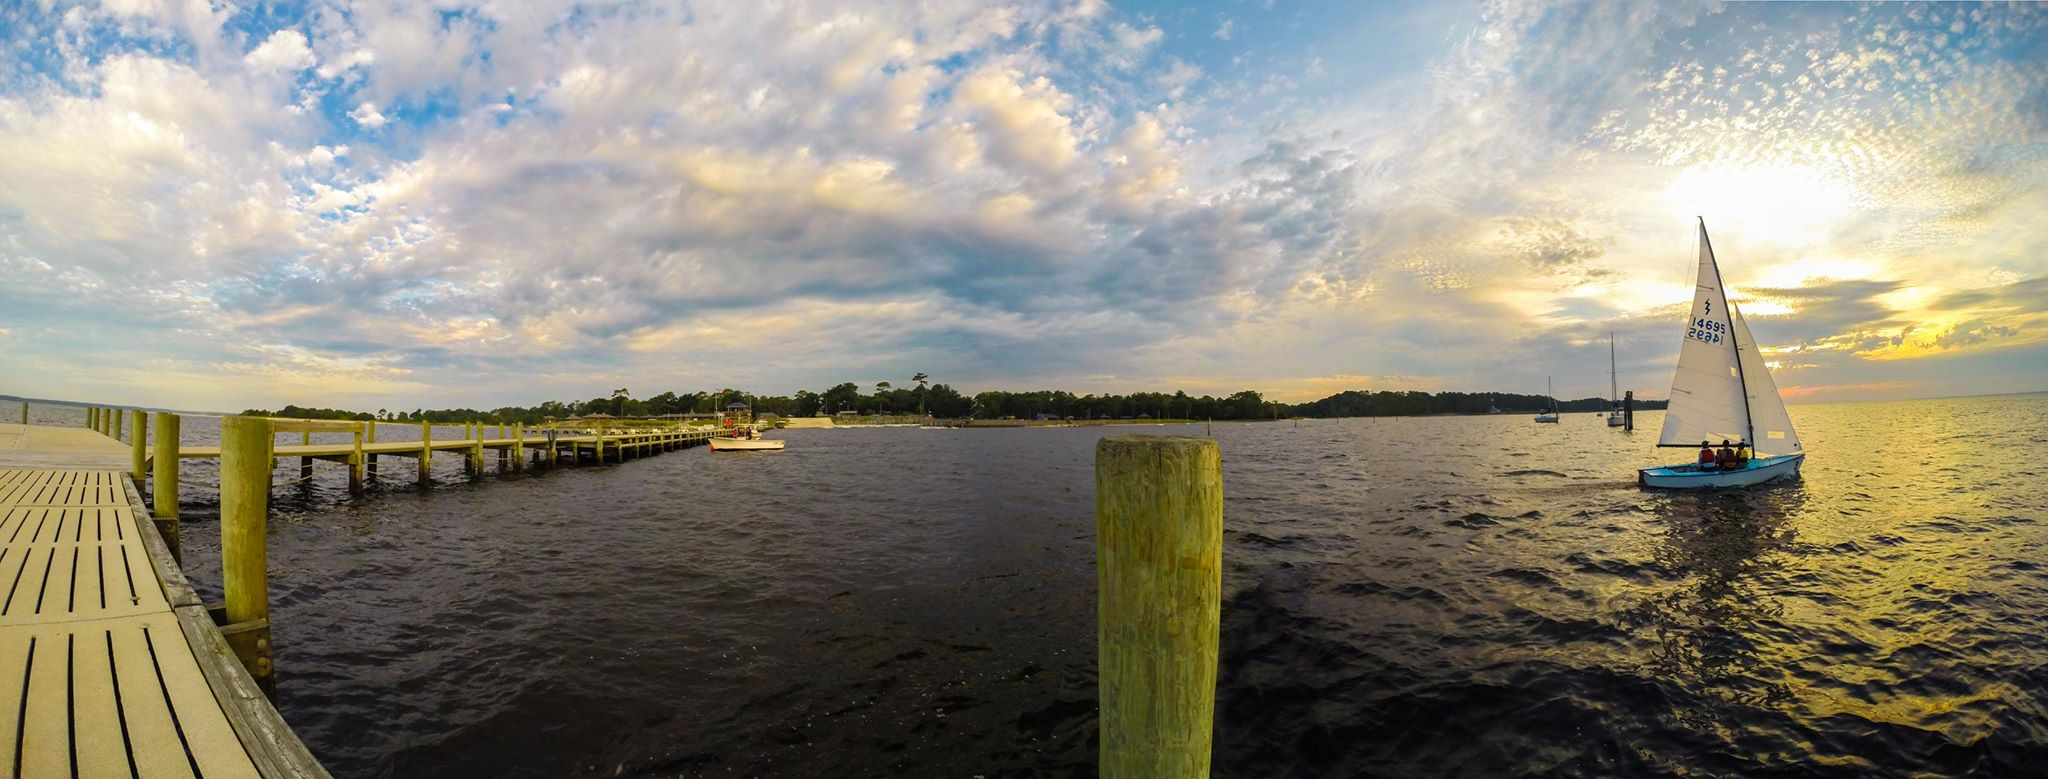 Sunrise sailing at Camp Sea Gull on the Neuse River